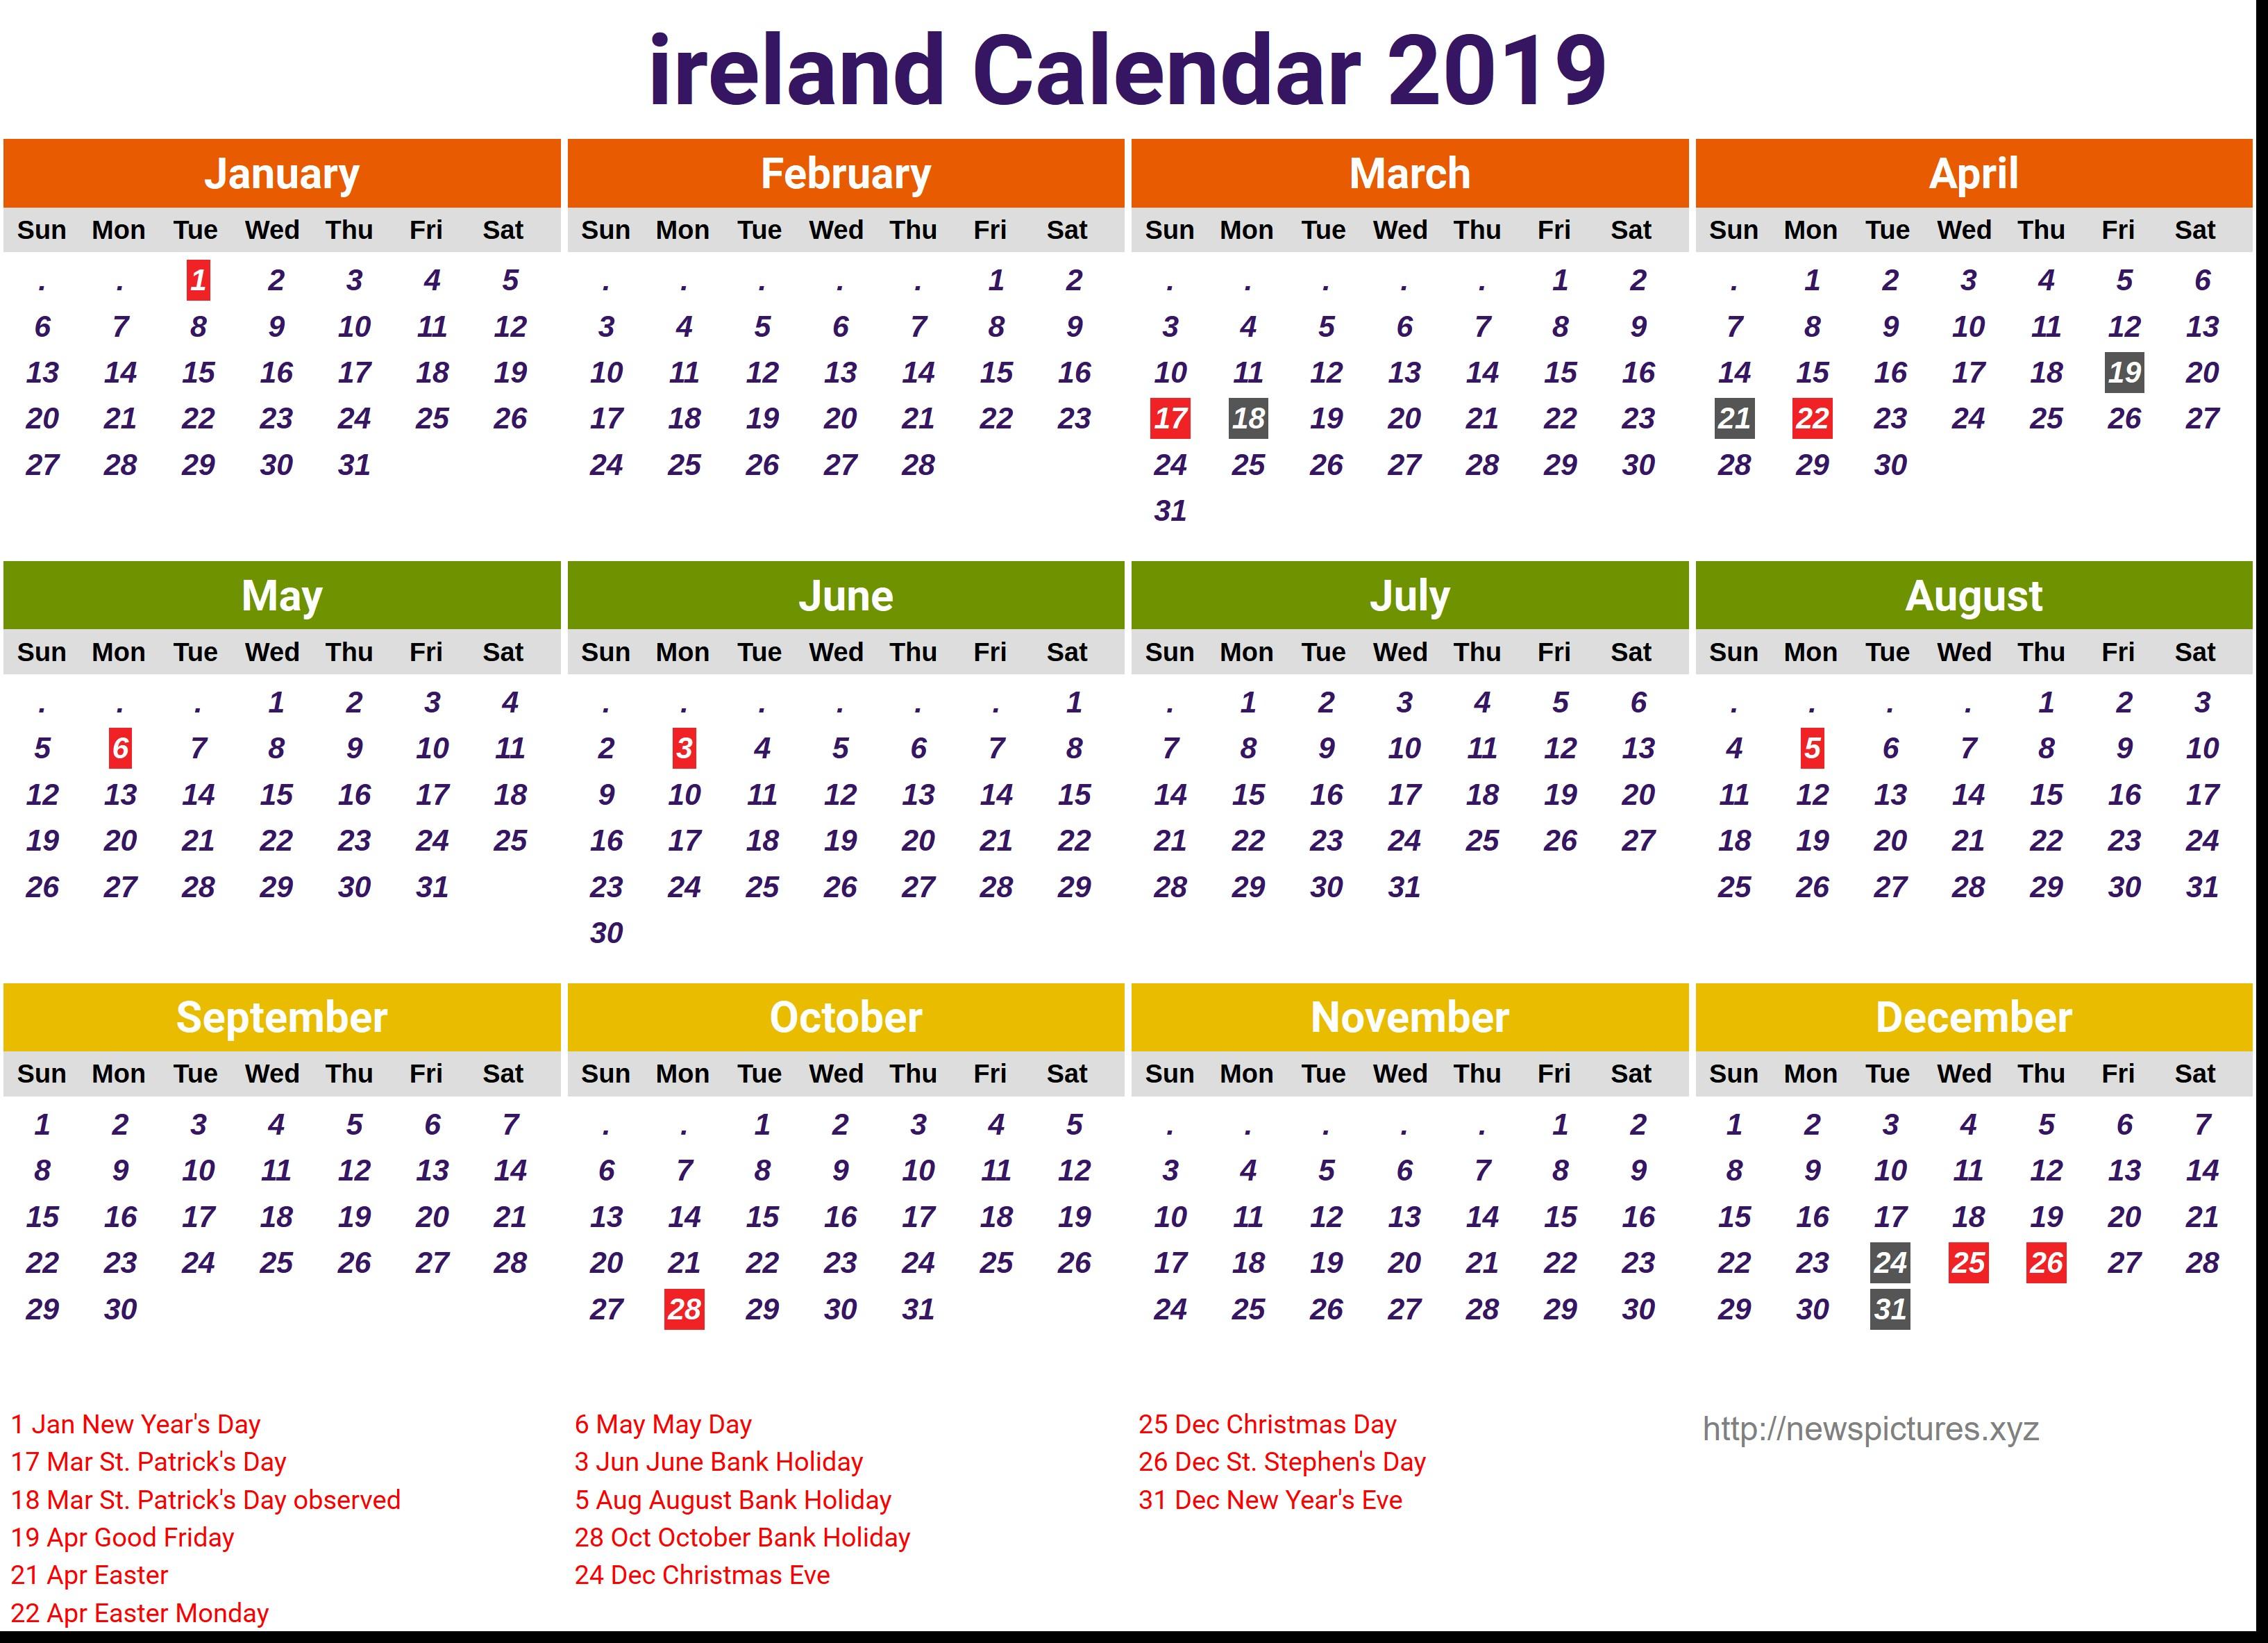 ireland official calendar 2019